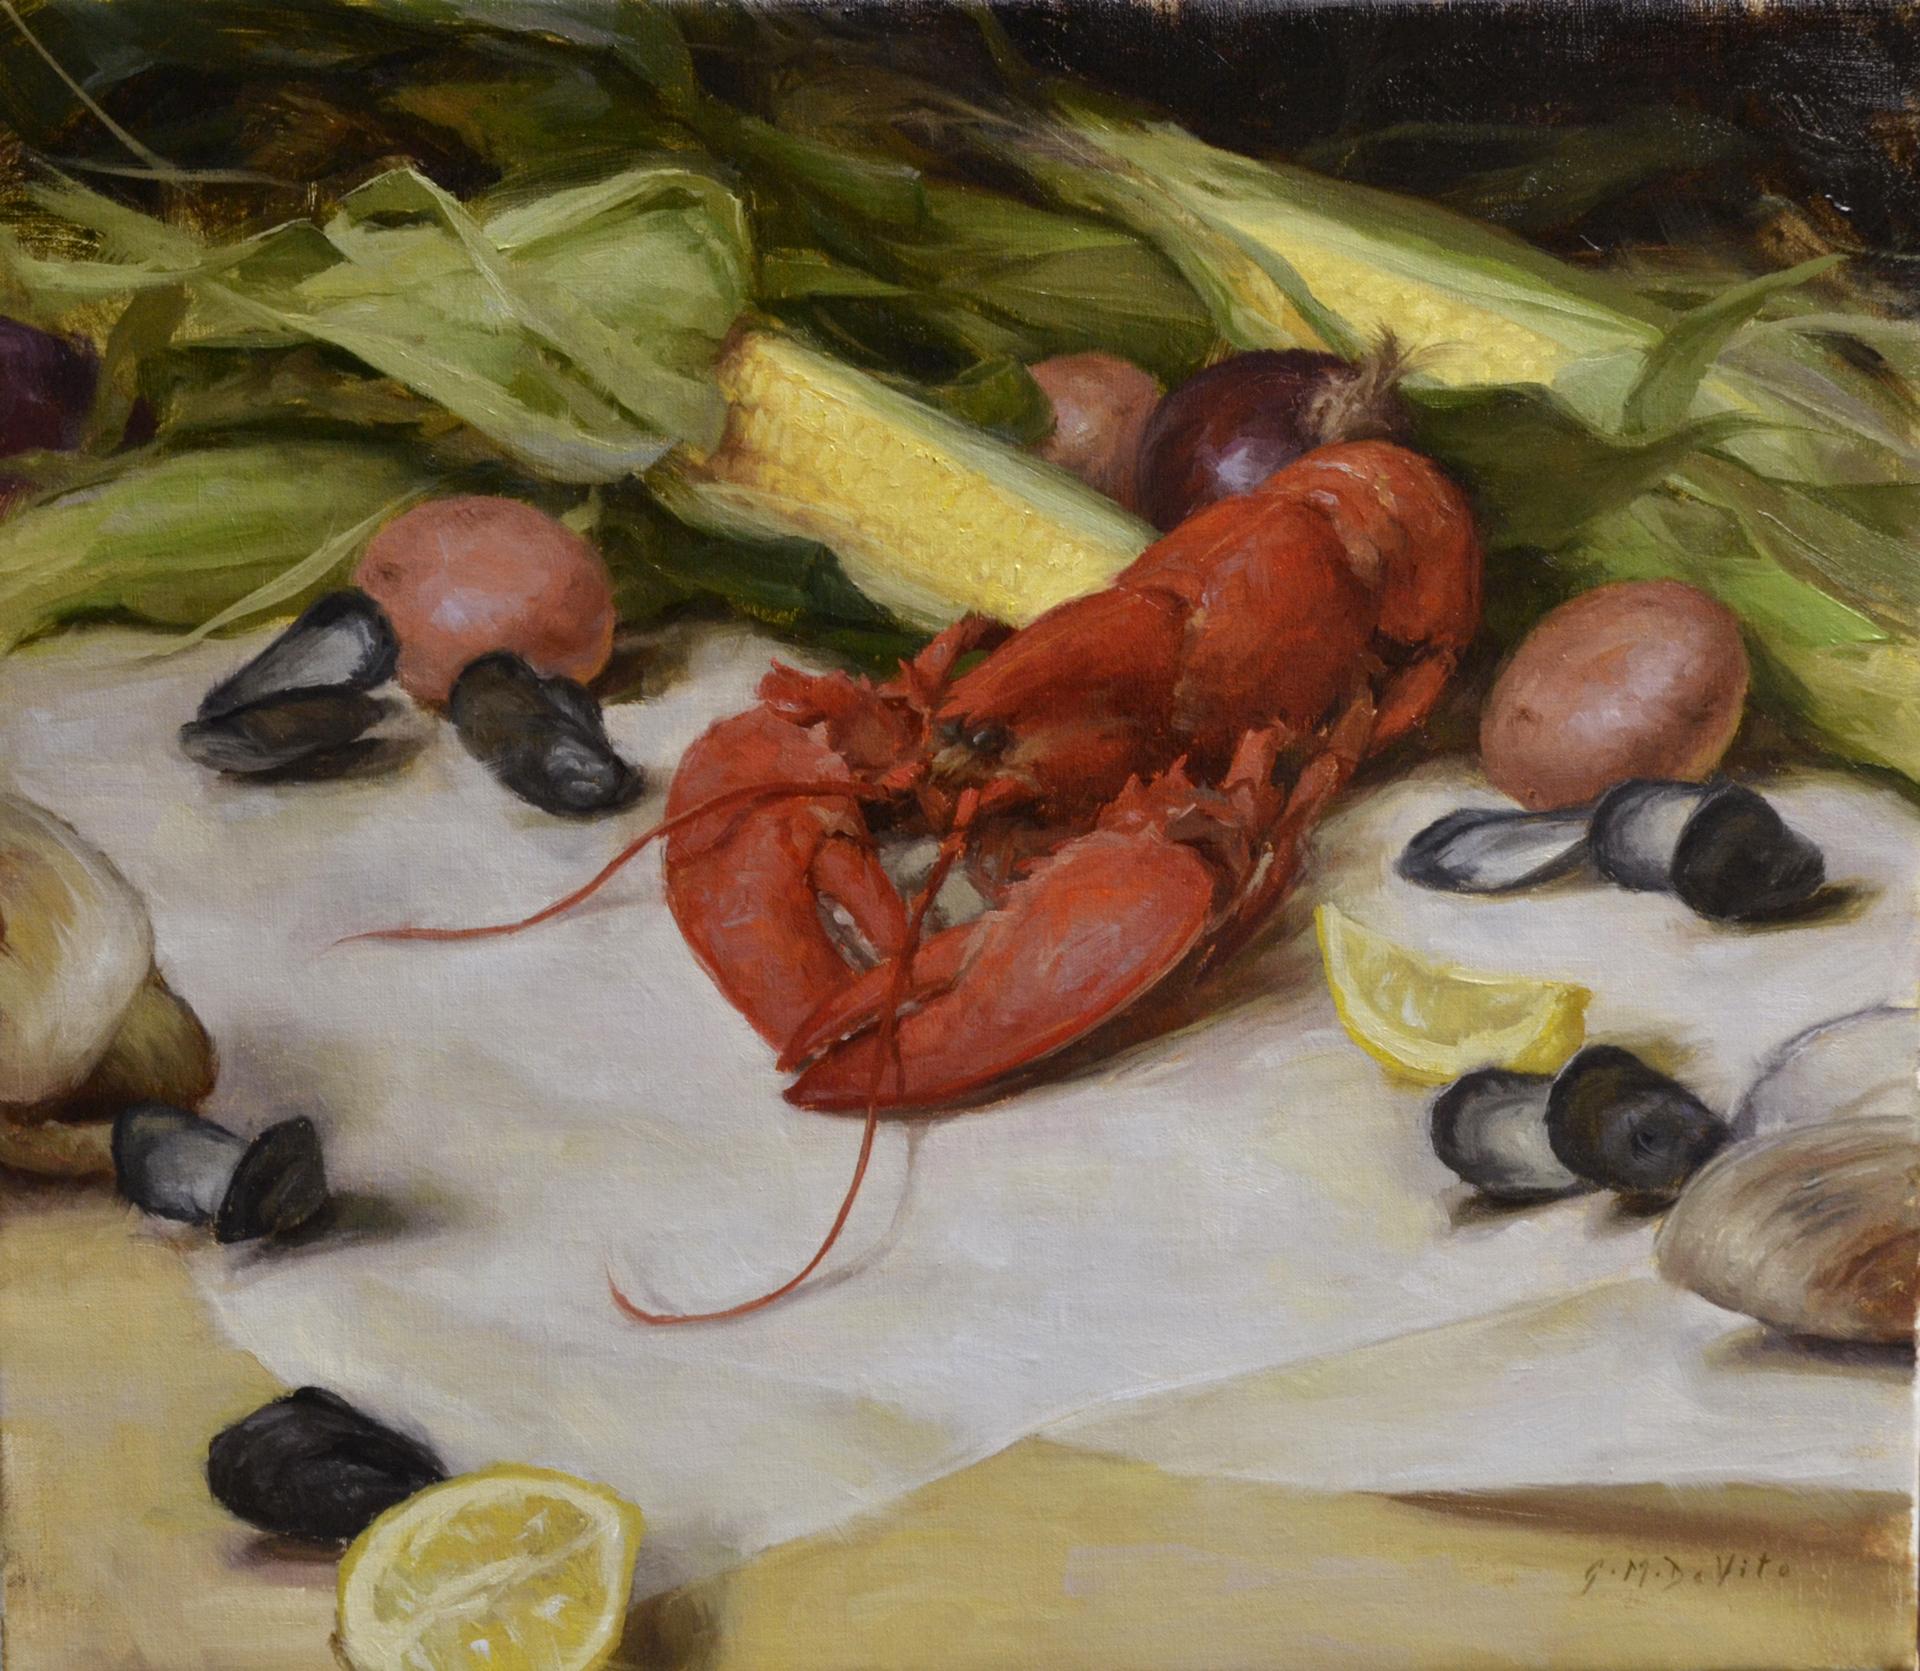 Lobster Boil by GRACE DeVITO